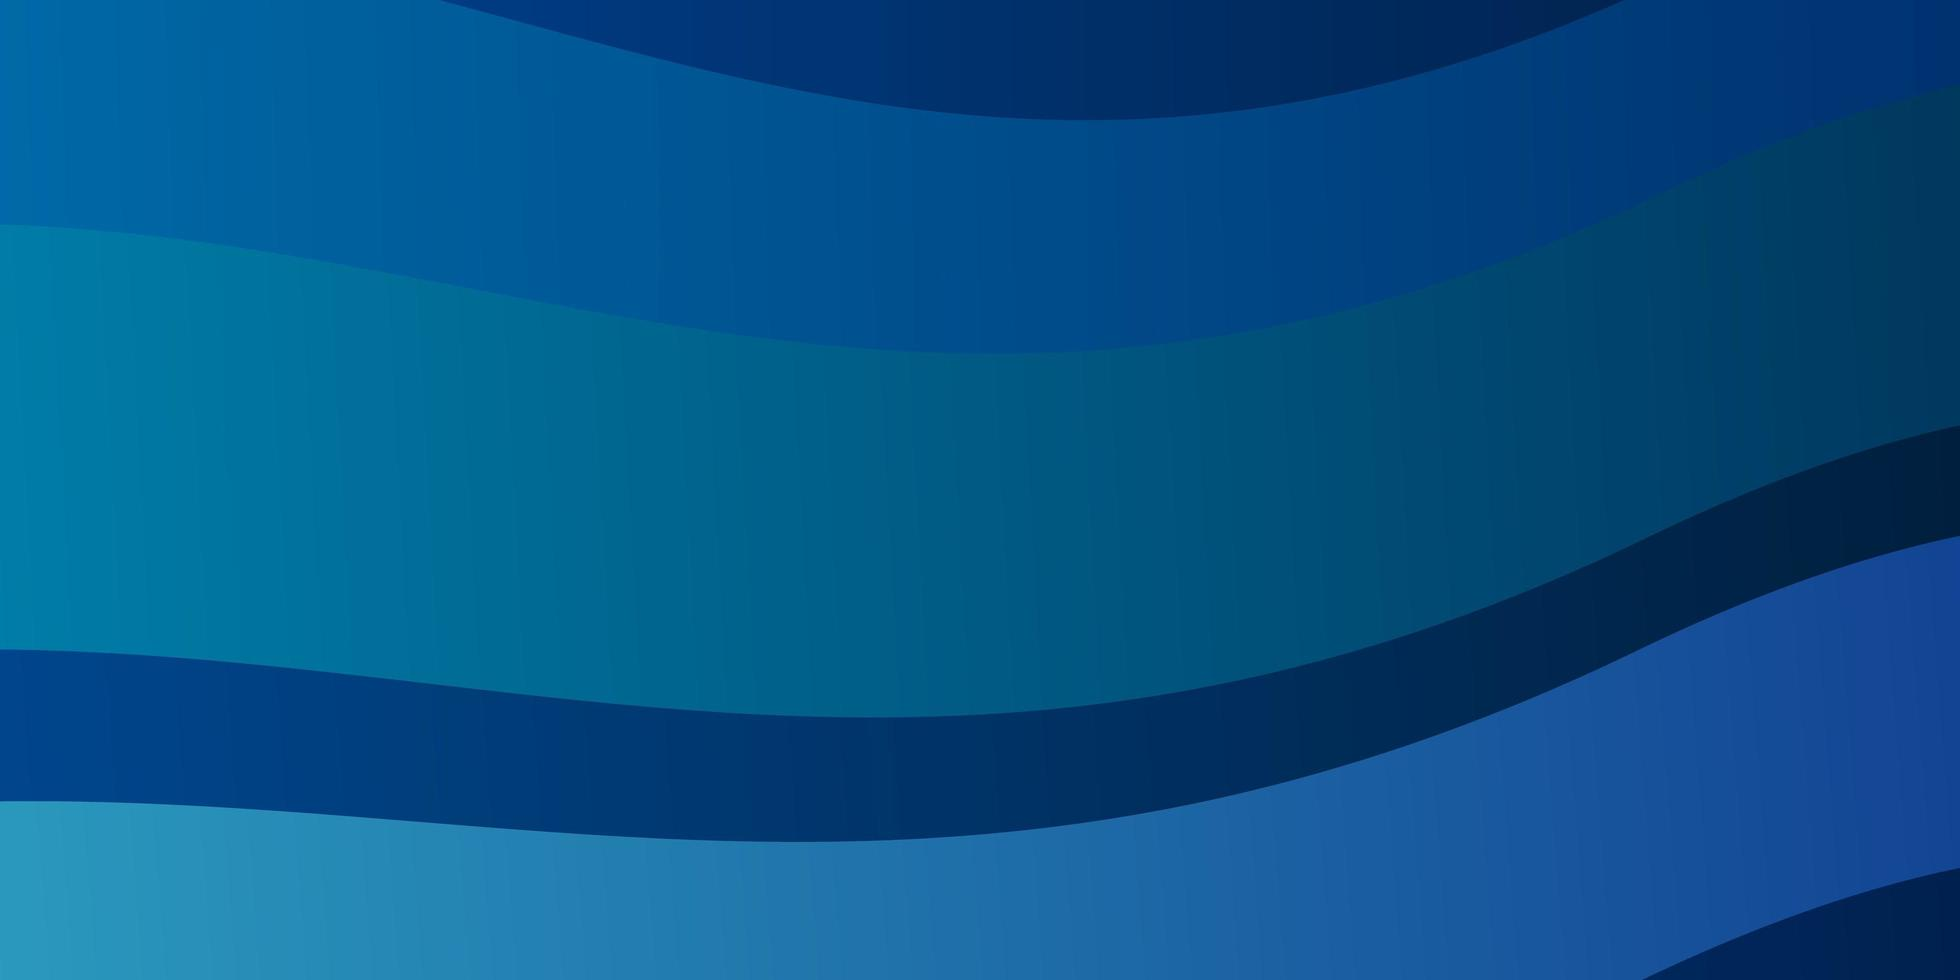 layout blu con linee piegate. vettore